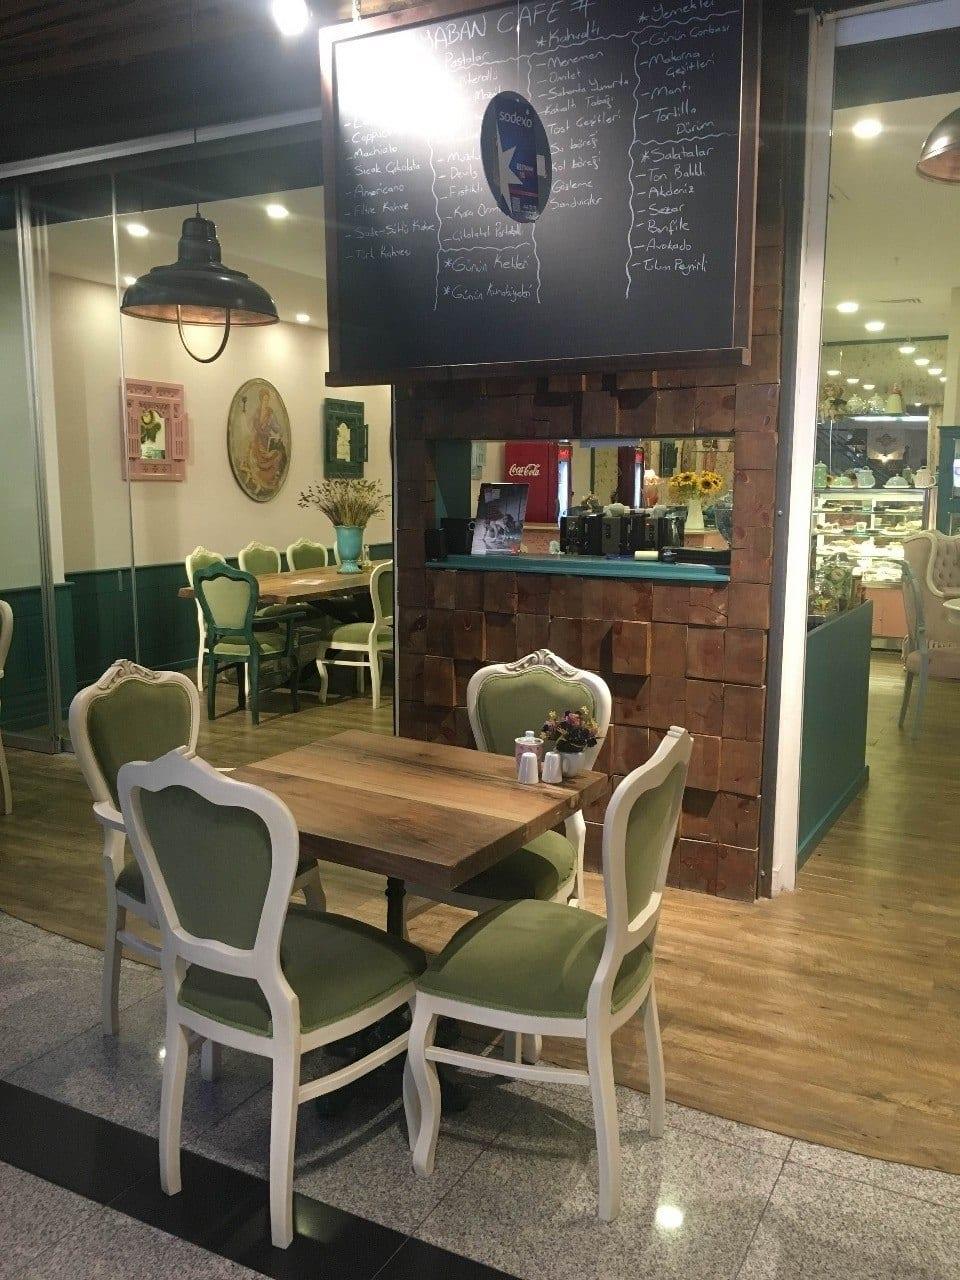 Yaban Cafe Menu Menu For Yaban Cafe Akatlar Istanbul